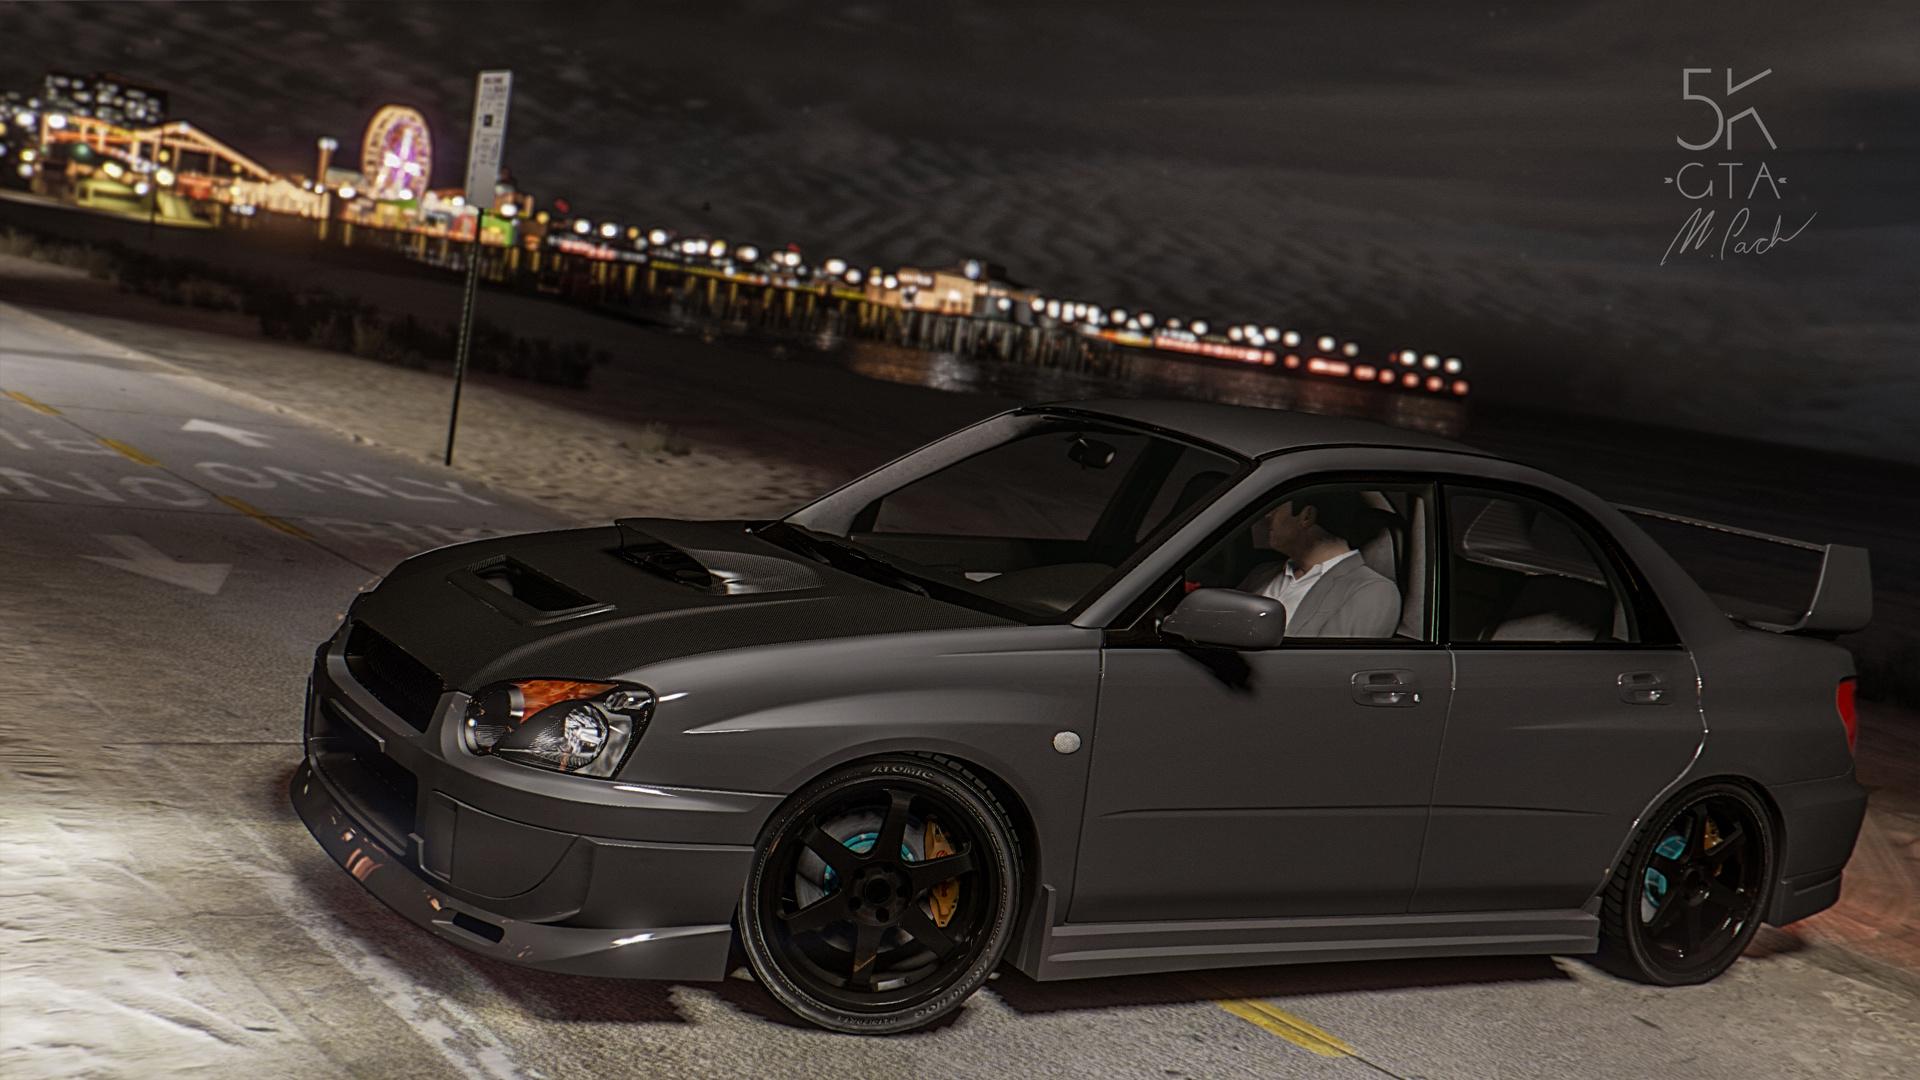 Subaru impreza wrx sti 2004 add on tuning gta5 mods 569d90 balksz 13 altavistaventures Gallery